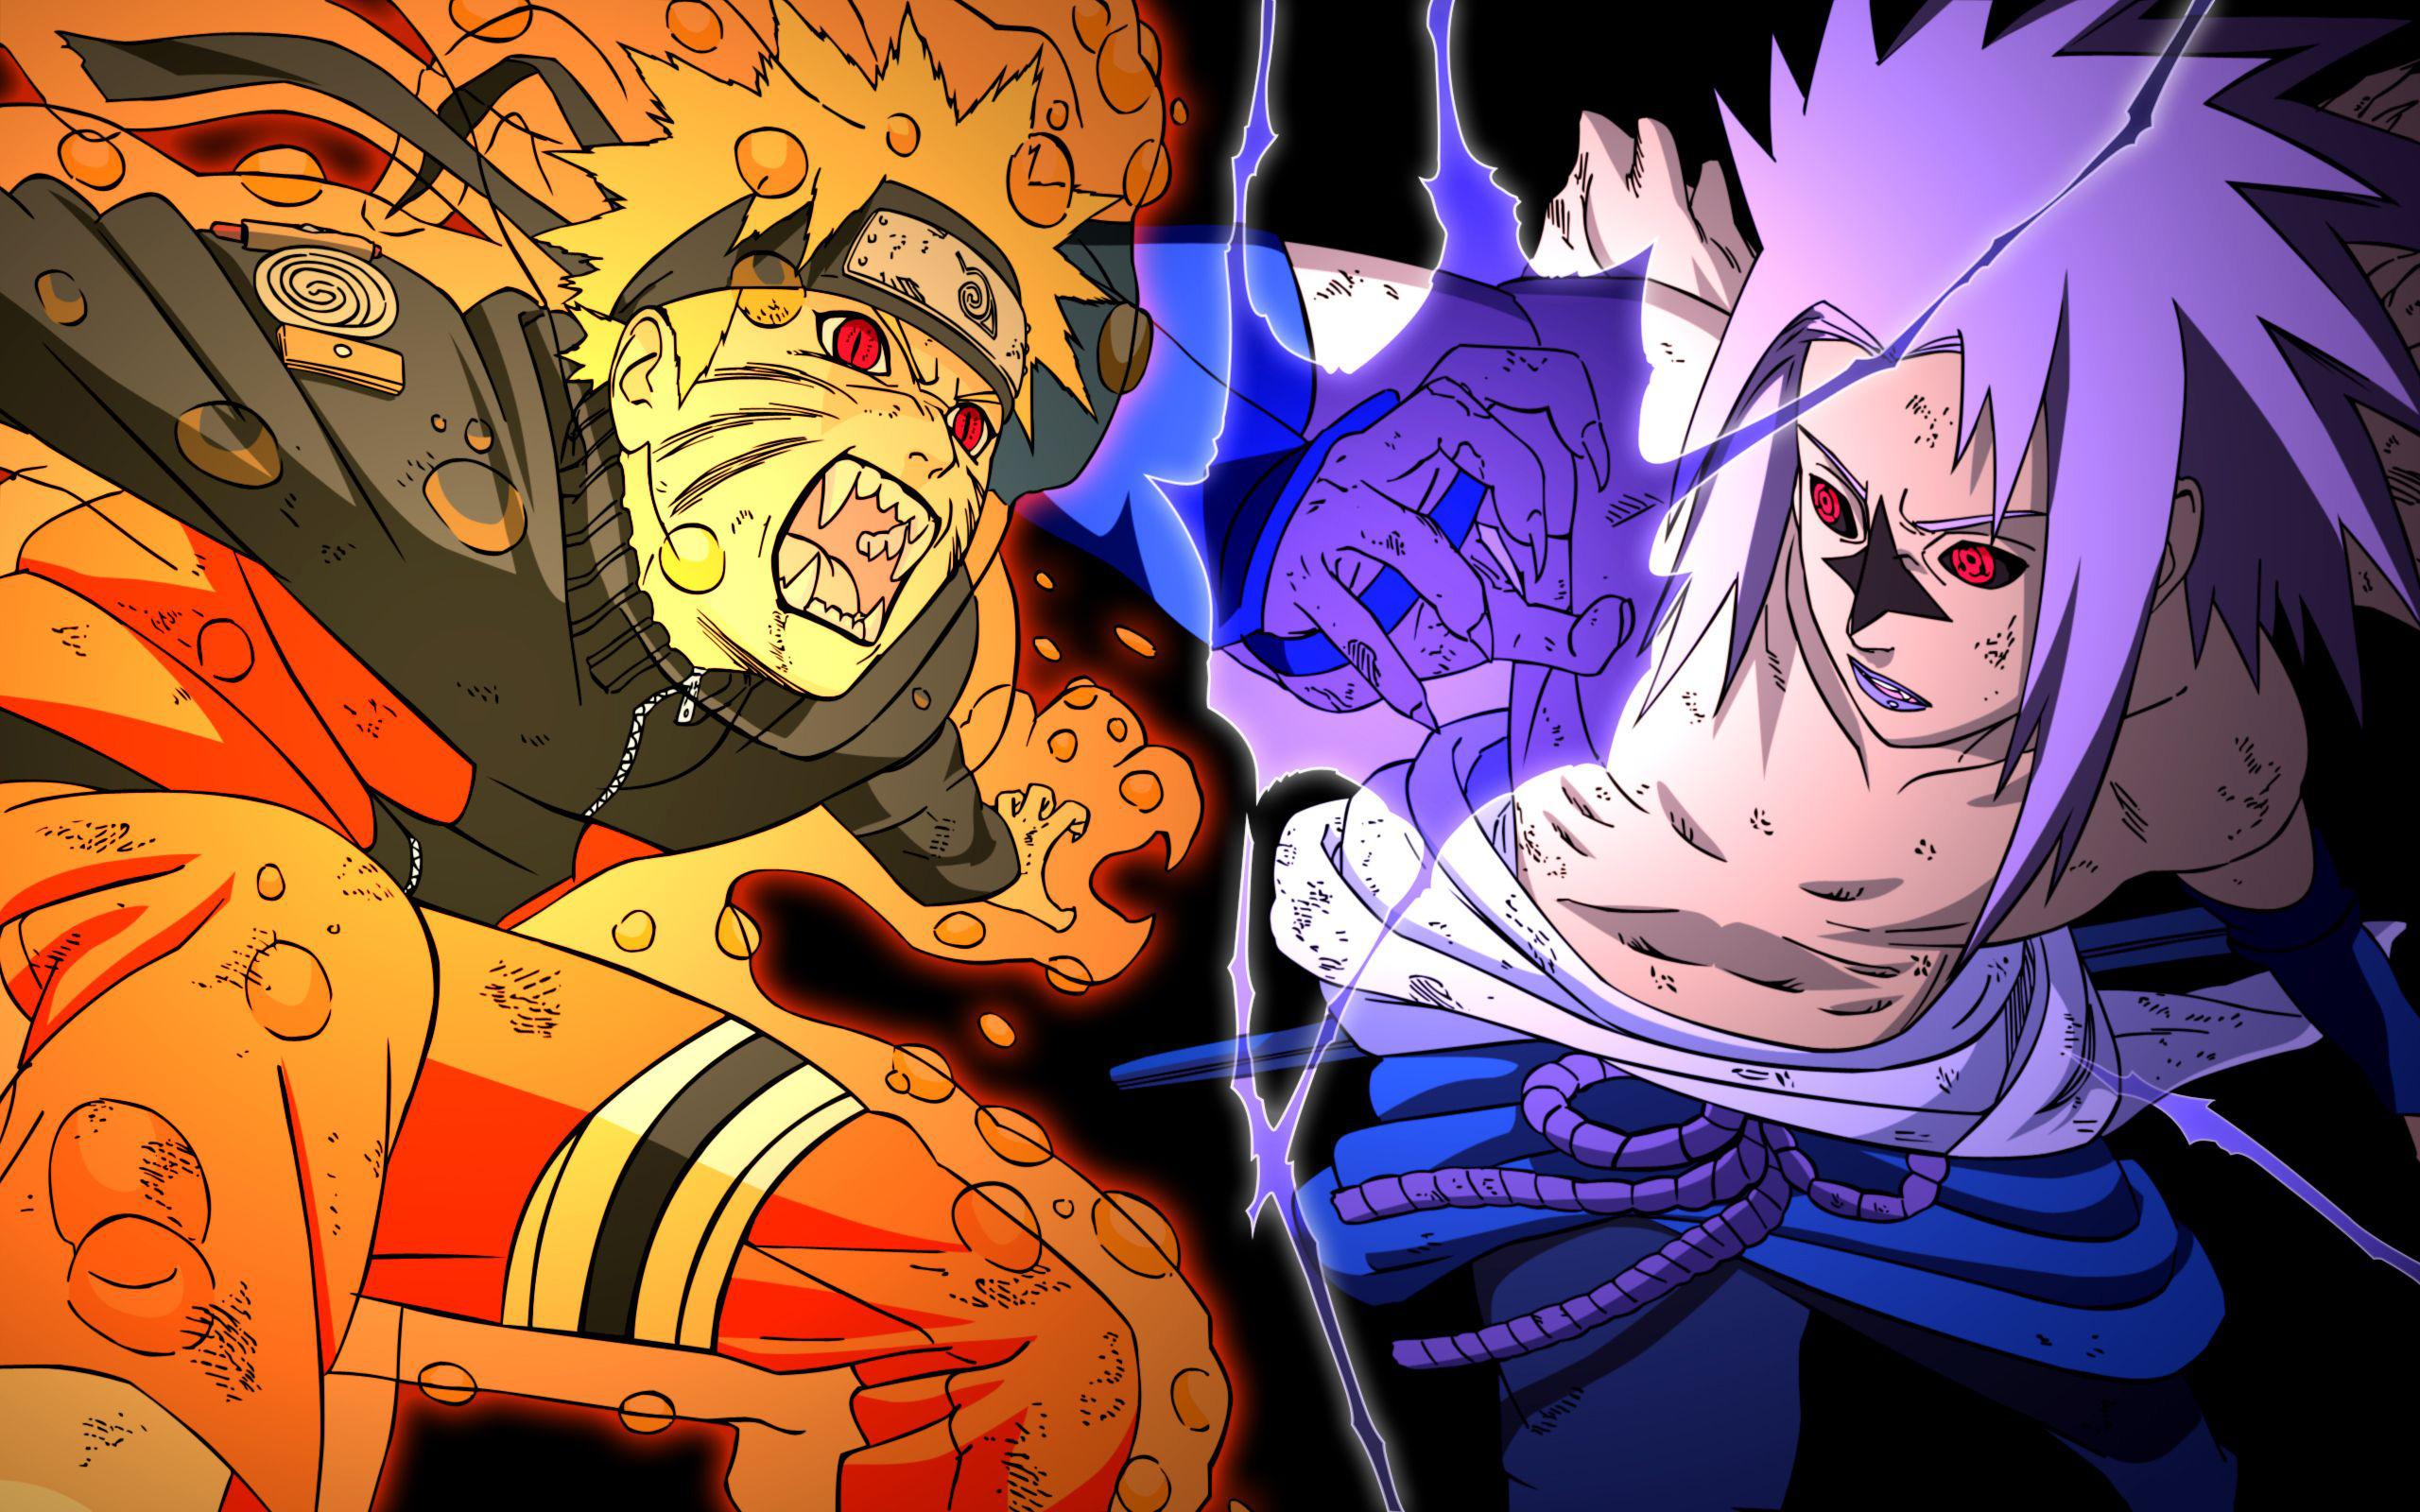 Naruto vs Sasuke HD Wallpaper 11MB 2560x1600